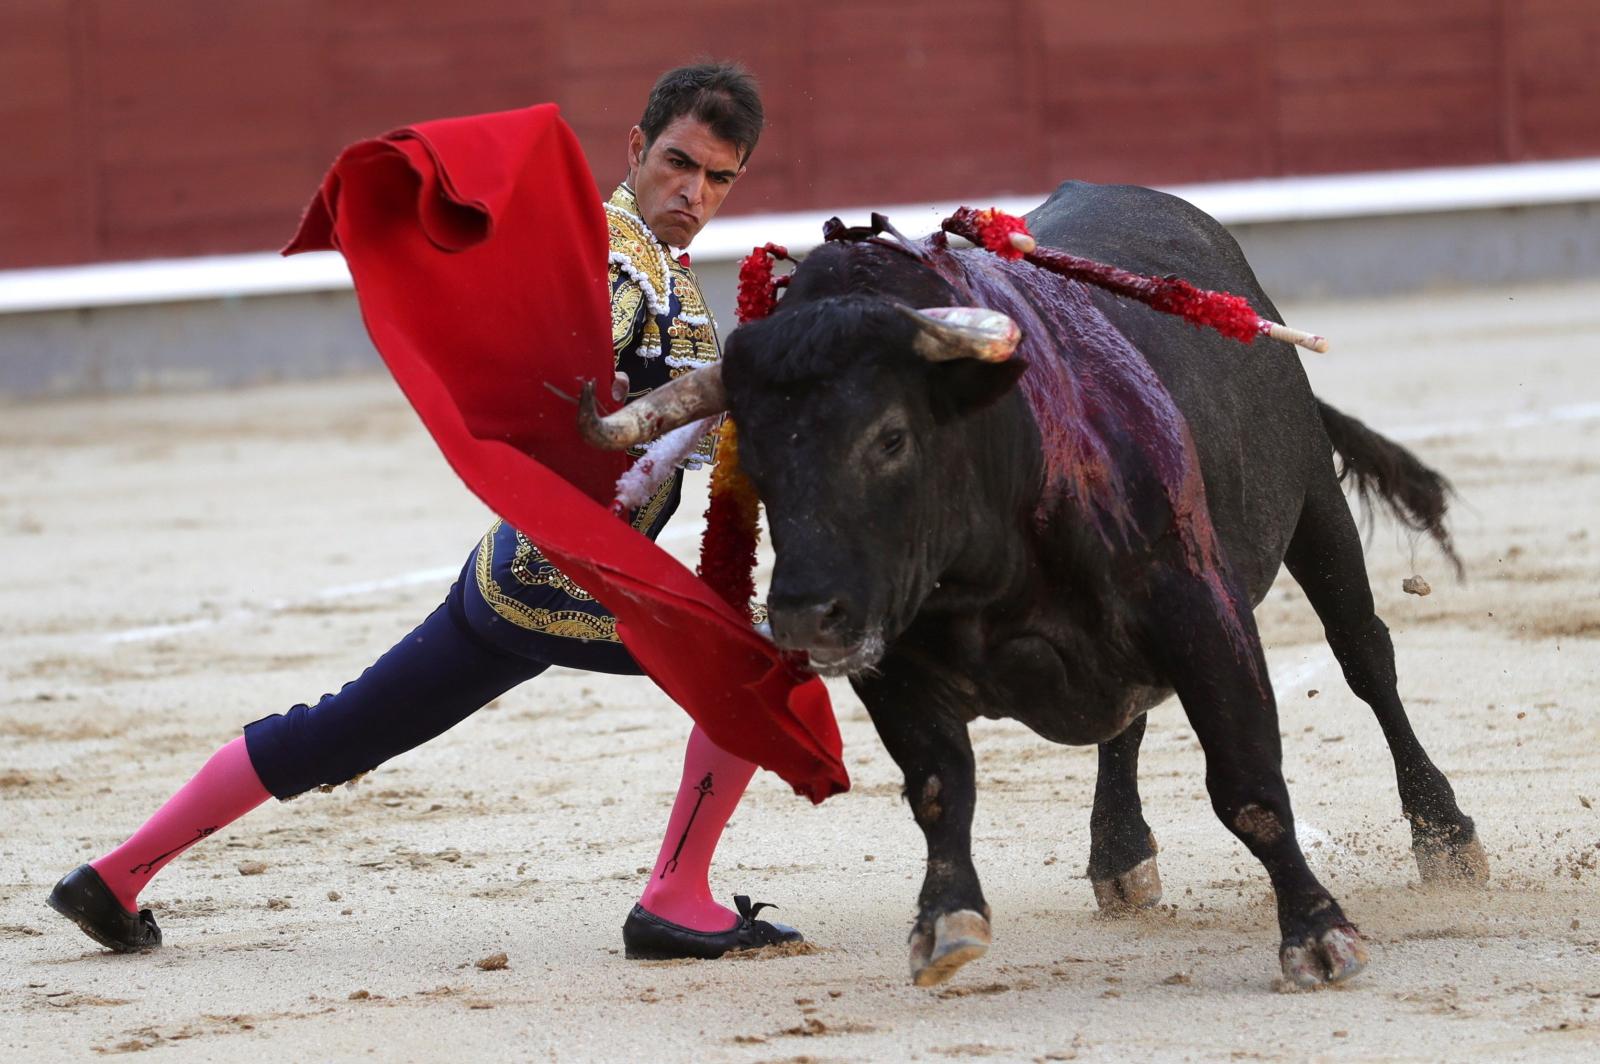 Zawody w Hiszpanii fot. EPA/JuanJo Martin